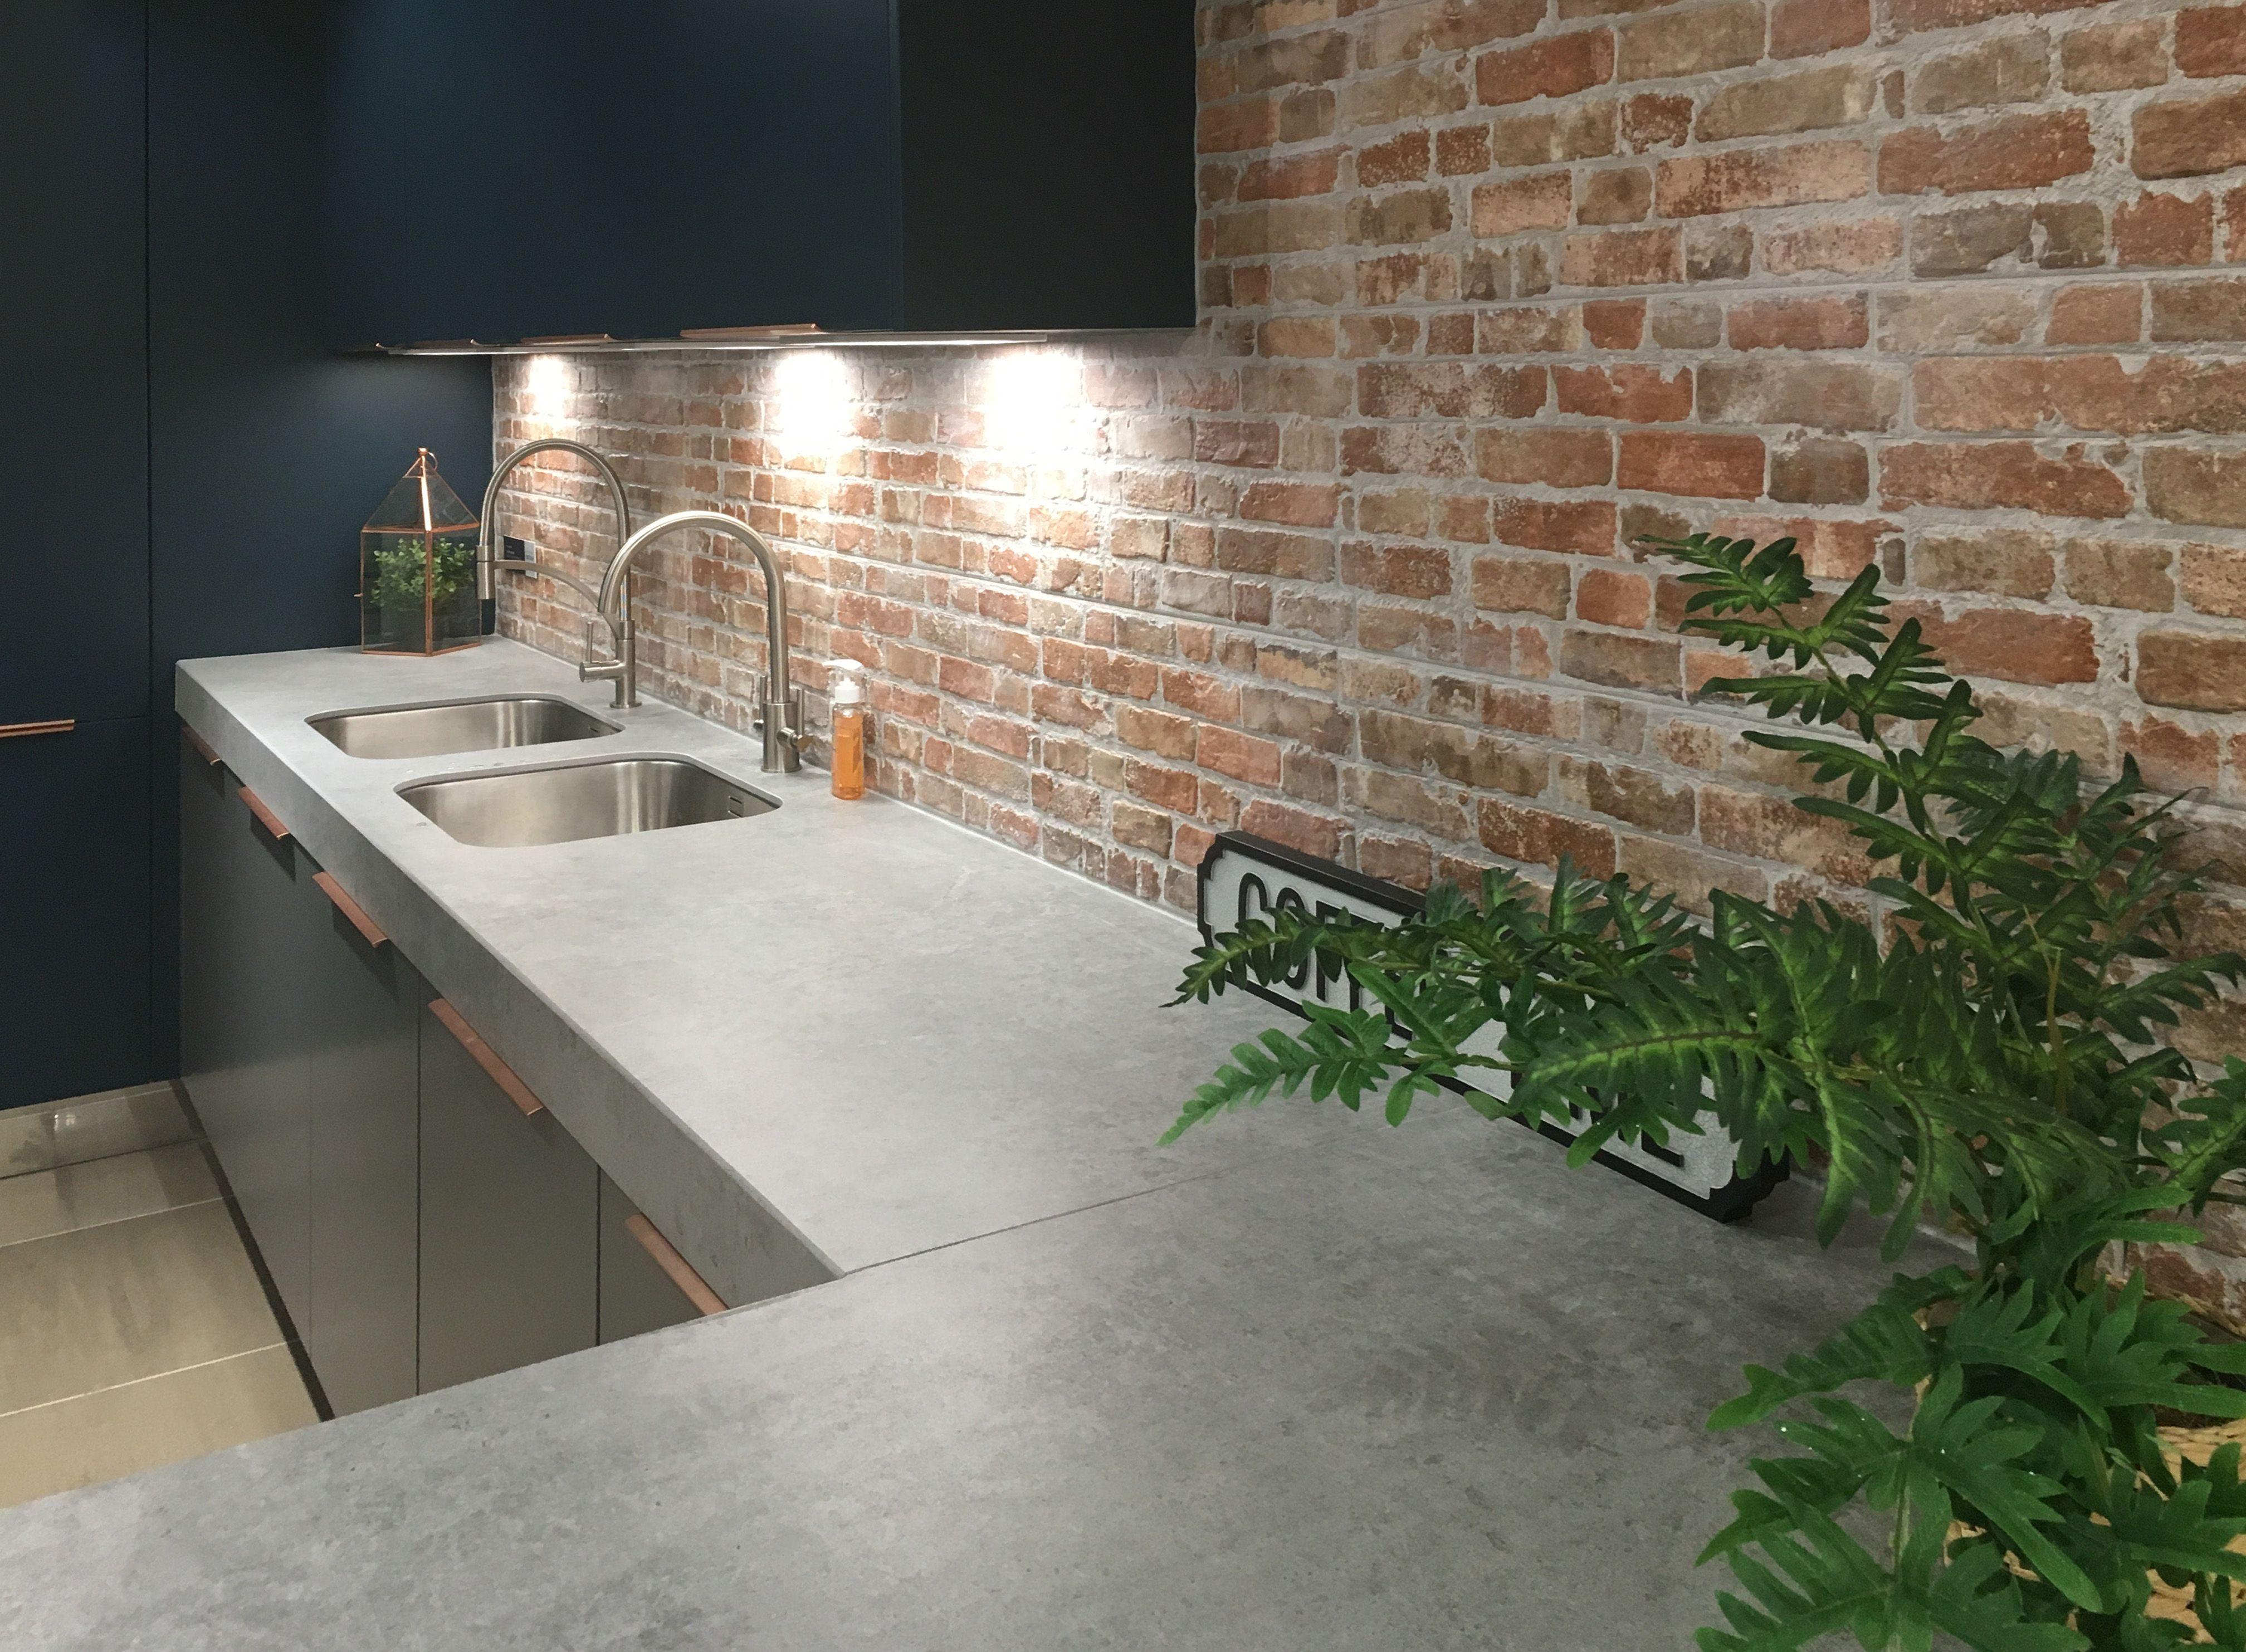 Kitchen Lighting Ideas   Brick kitchen, Exposed brick kitchen ...